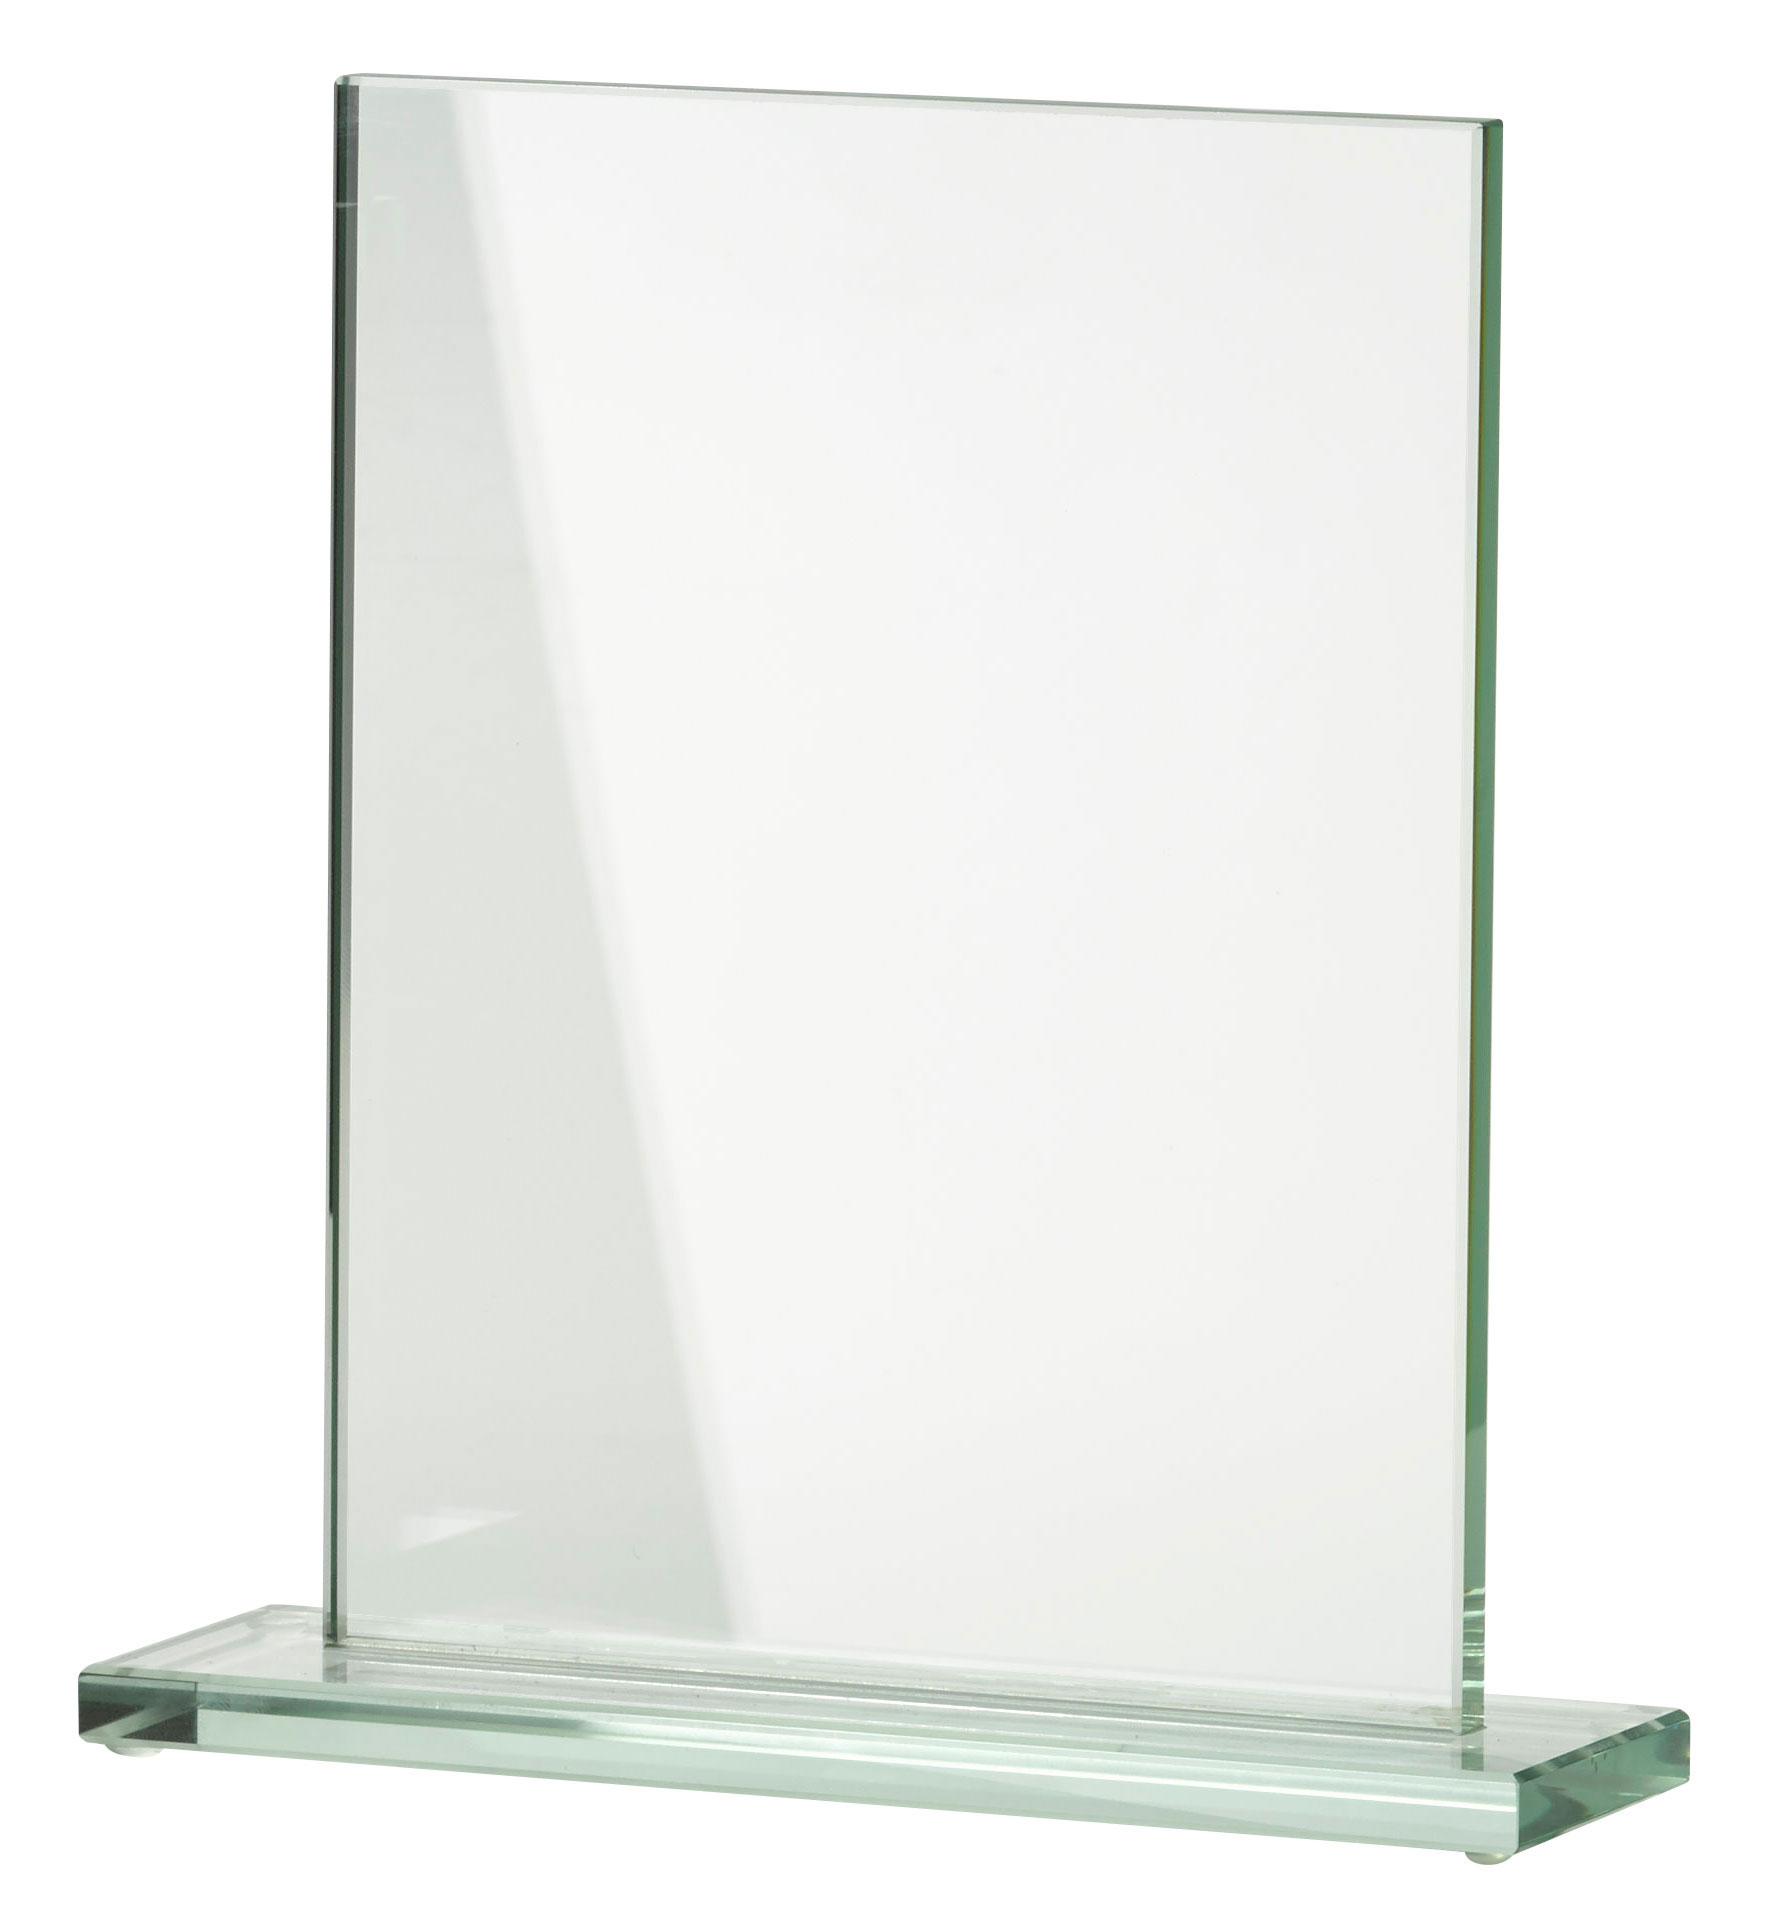 Glas standaard B326 | Sportprijzen Vught